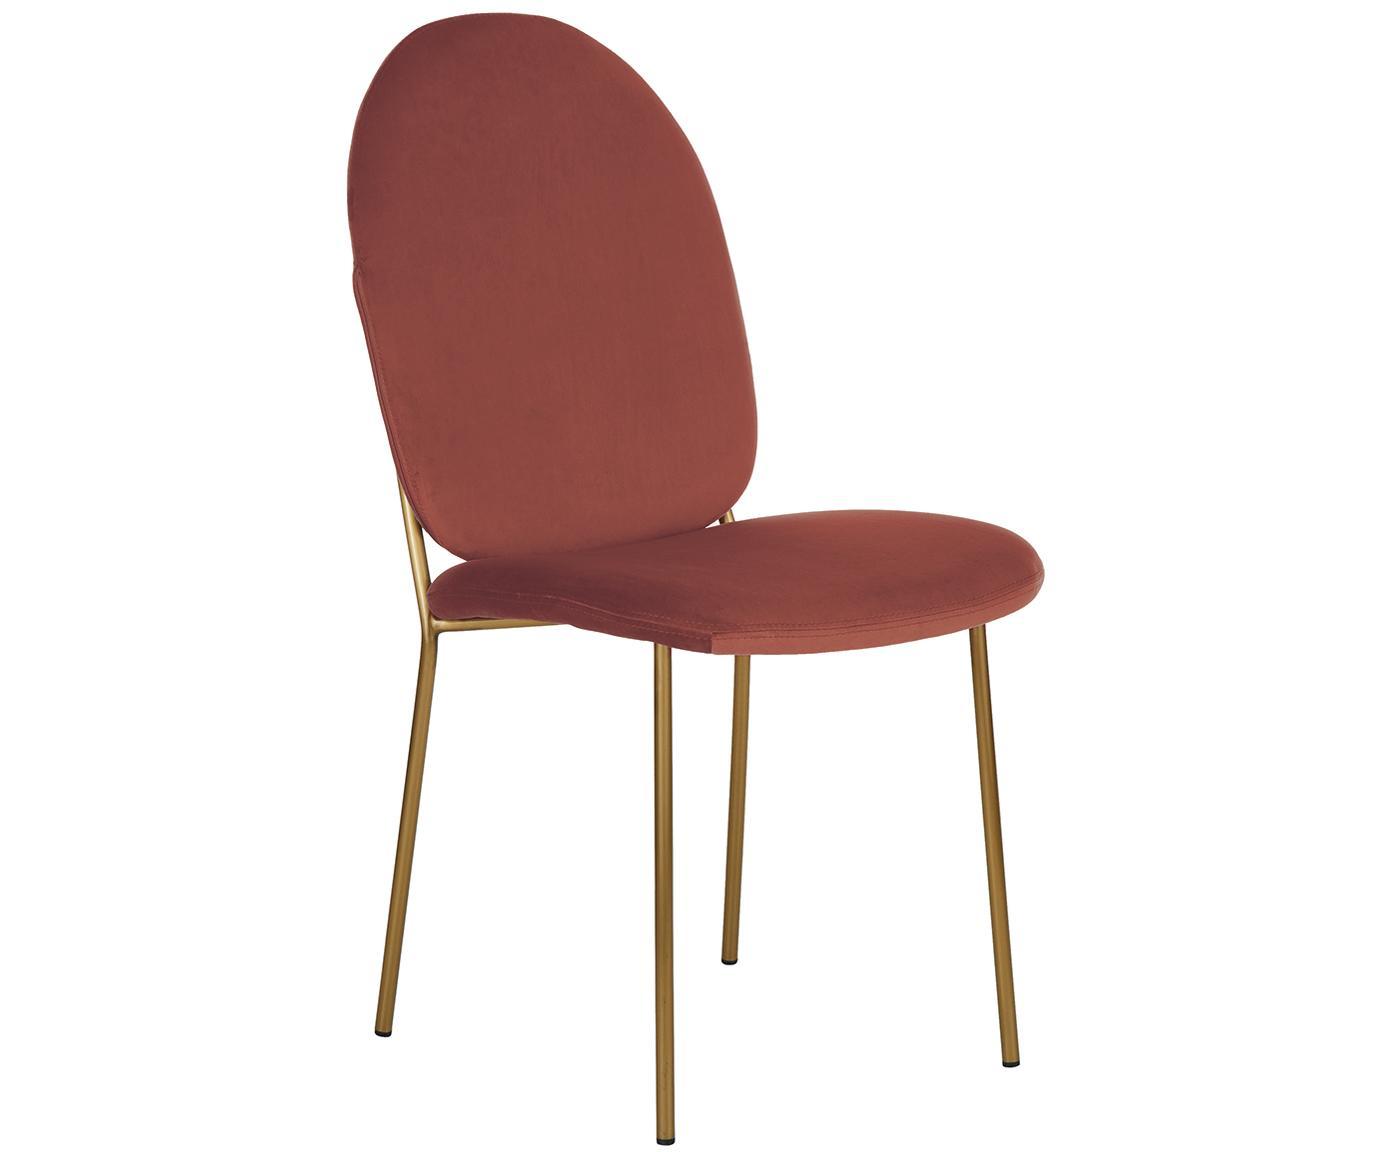 Sedia imbottita in velluto Mary, Rivestimento: velluto (poliestere) 15.0, Gambe: metallo rivestito, Terracotta, Larg. 44 x Prof. 65 cm